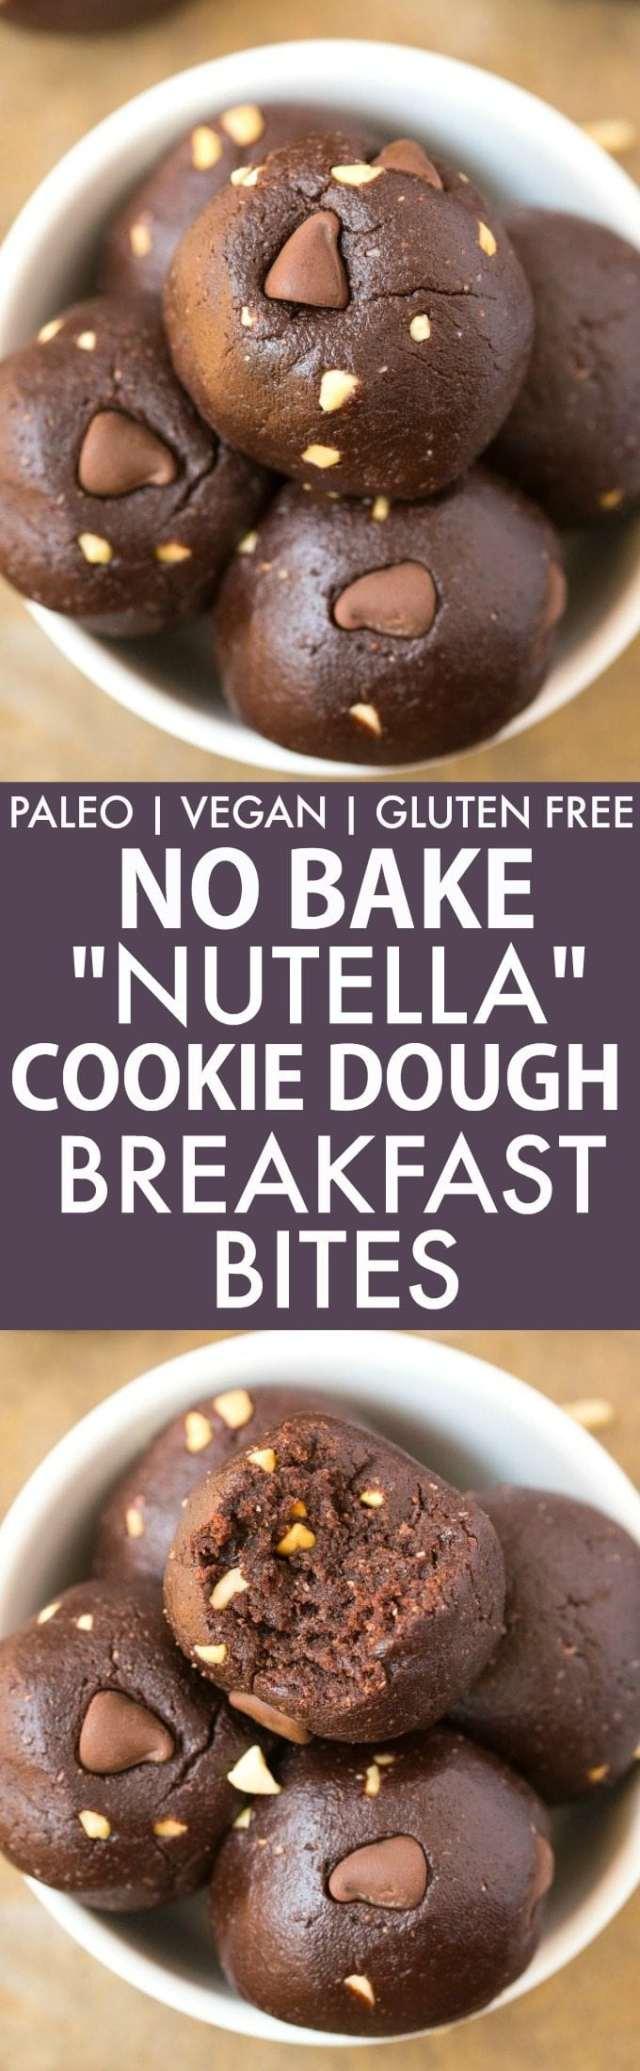 No Bake Nutella Cookie Dough Breakfast Bites (Paleo, Vegan